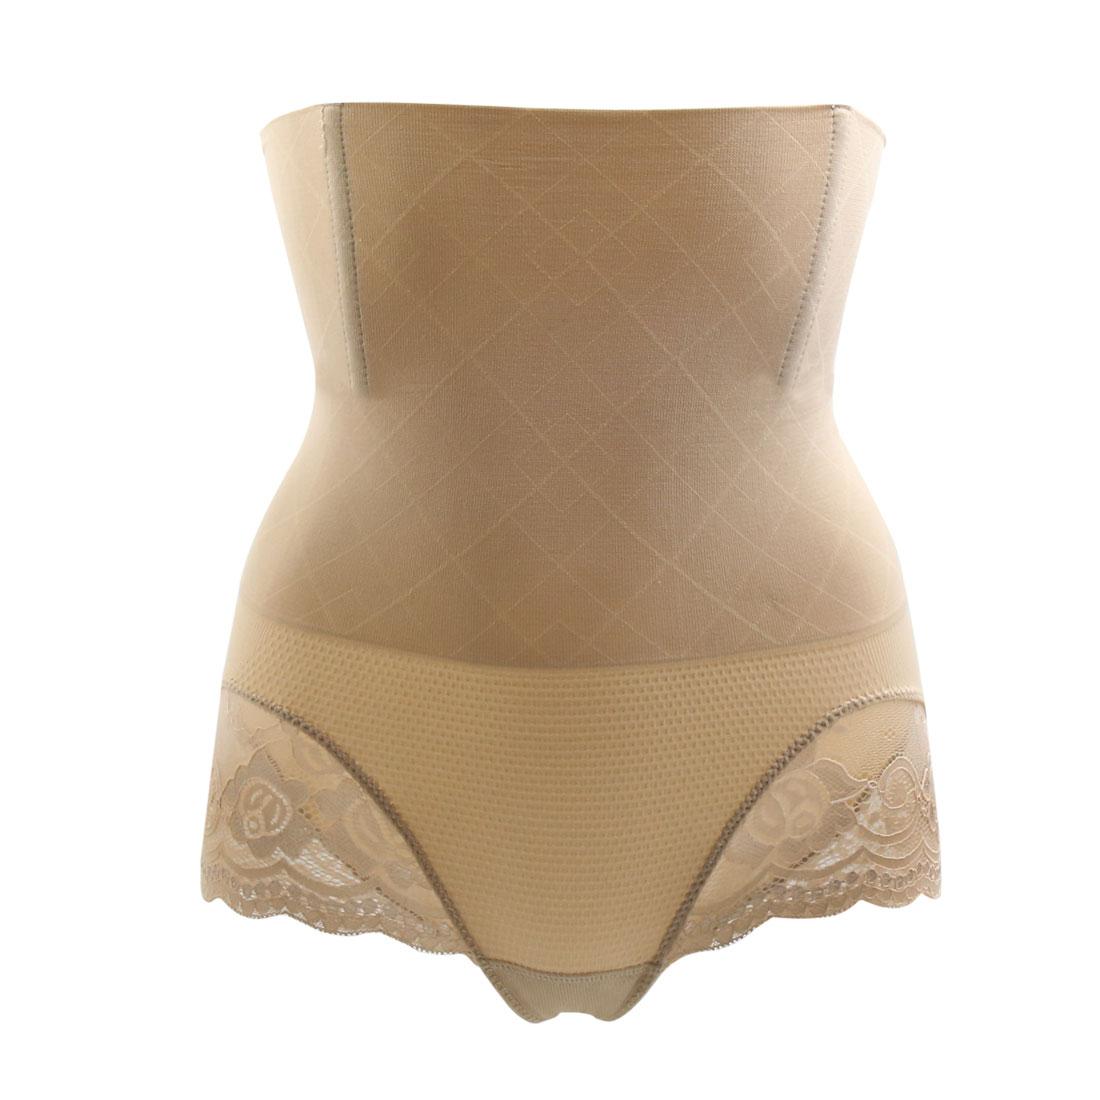 Size M Beige Lace Edge Waist Trainer Body Shaper Panty Tummy Control Butt Push Up Cincher Shapewear